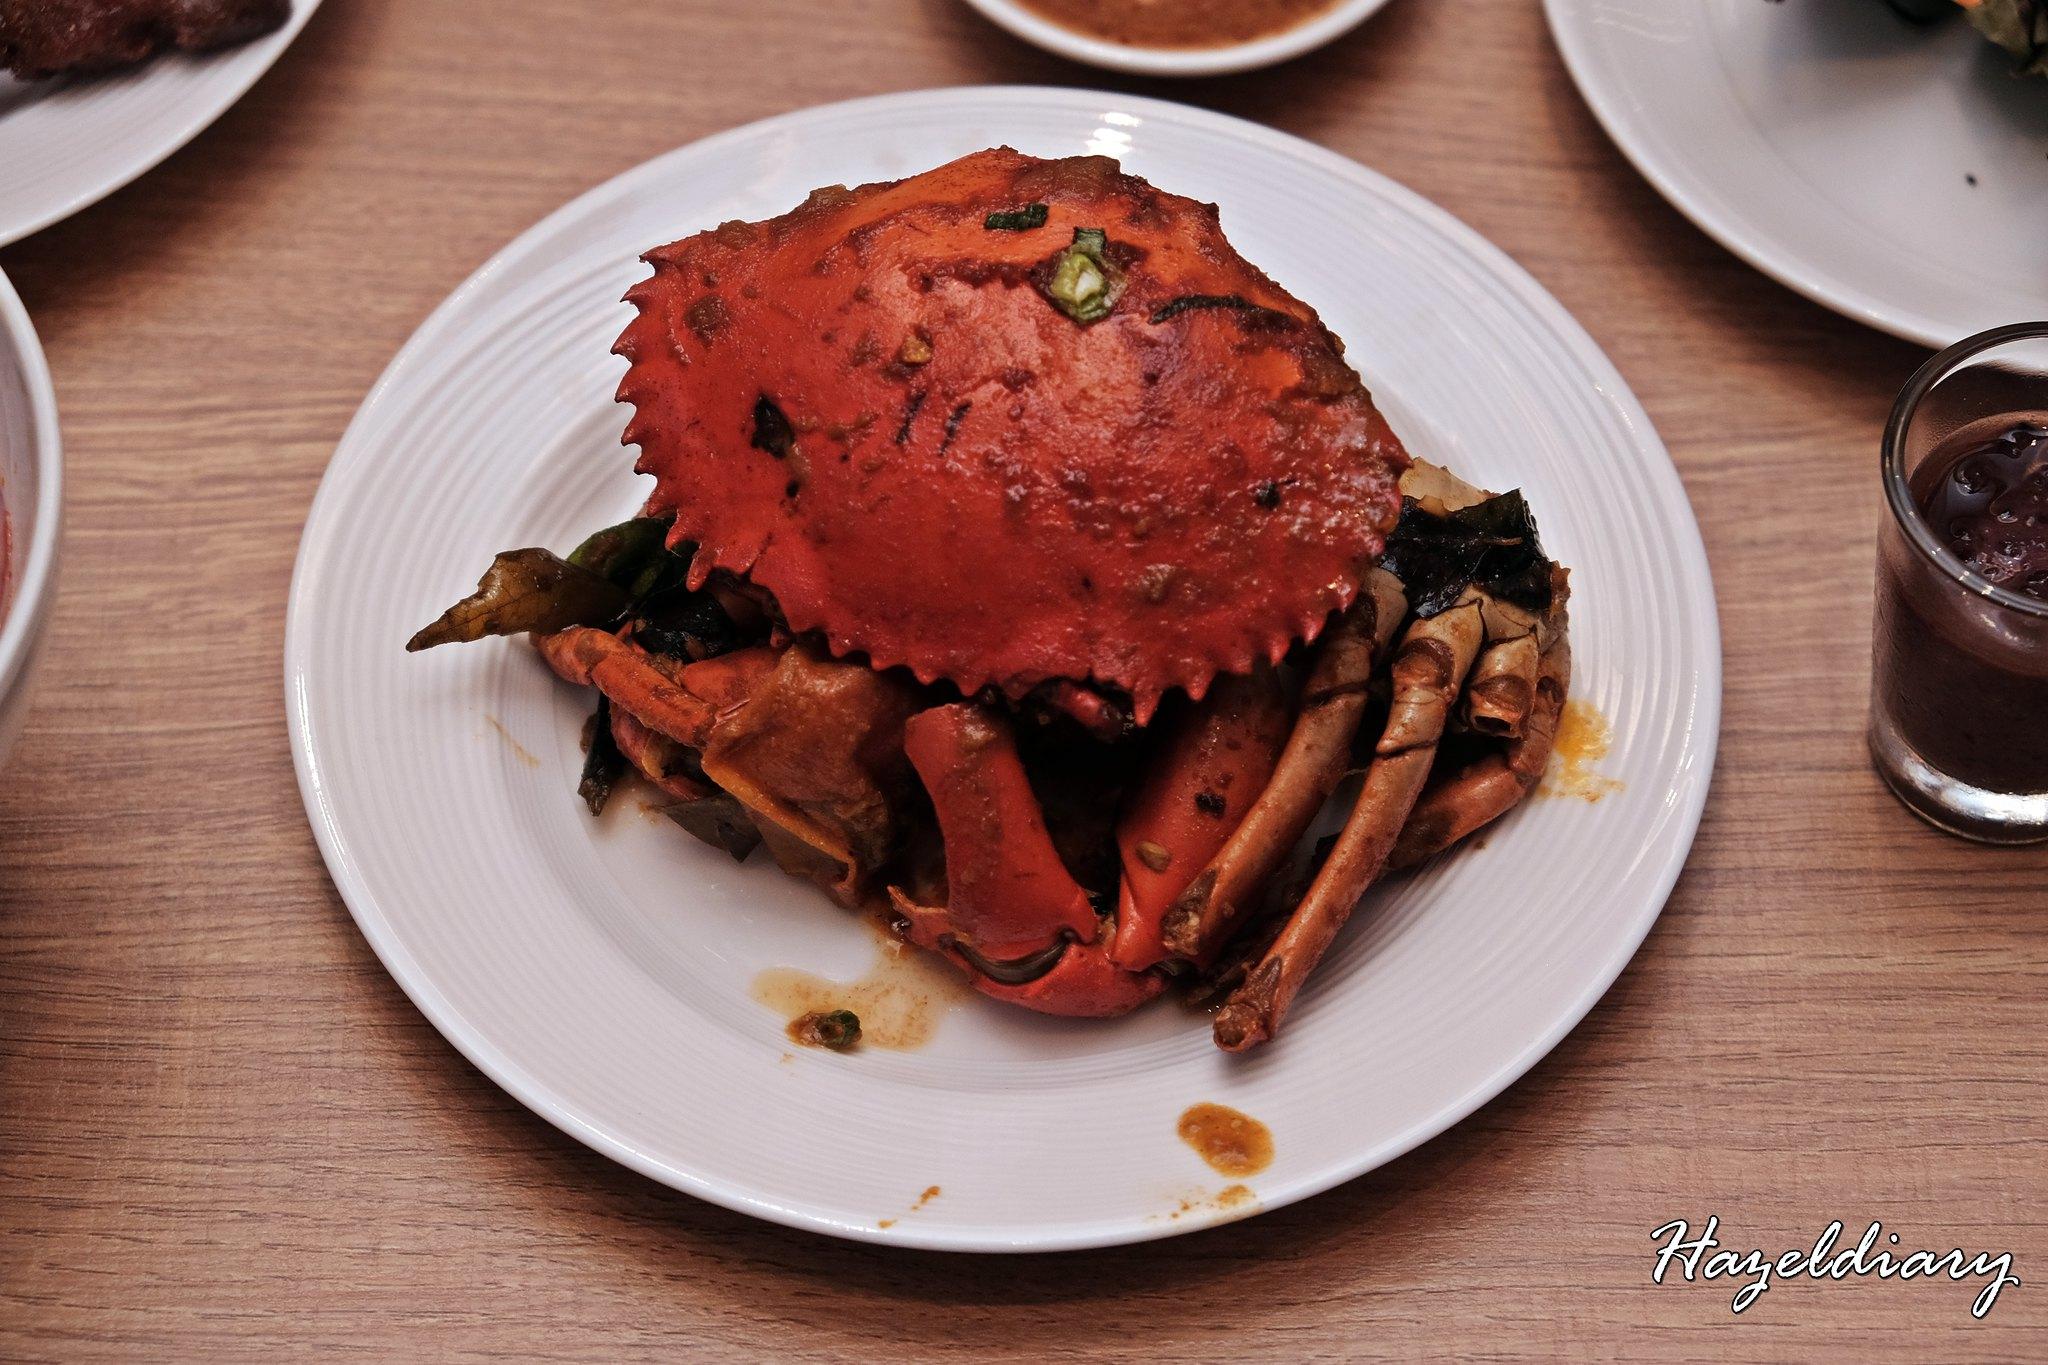 Penang Food Fare Buffet-Sky22 Courtyard Marriott-4